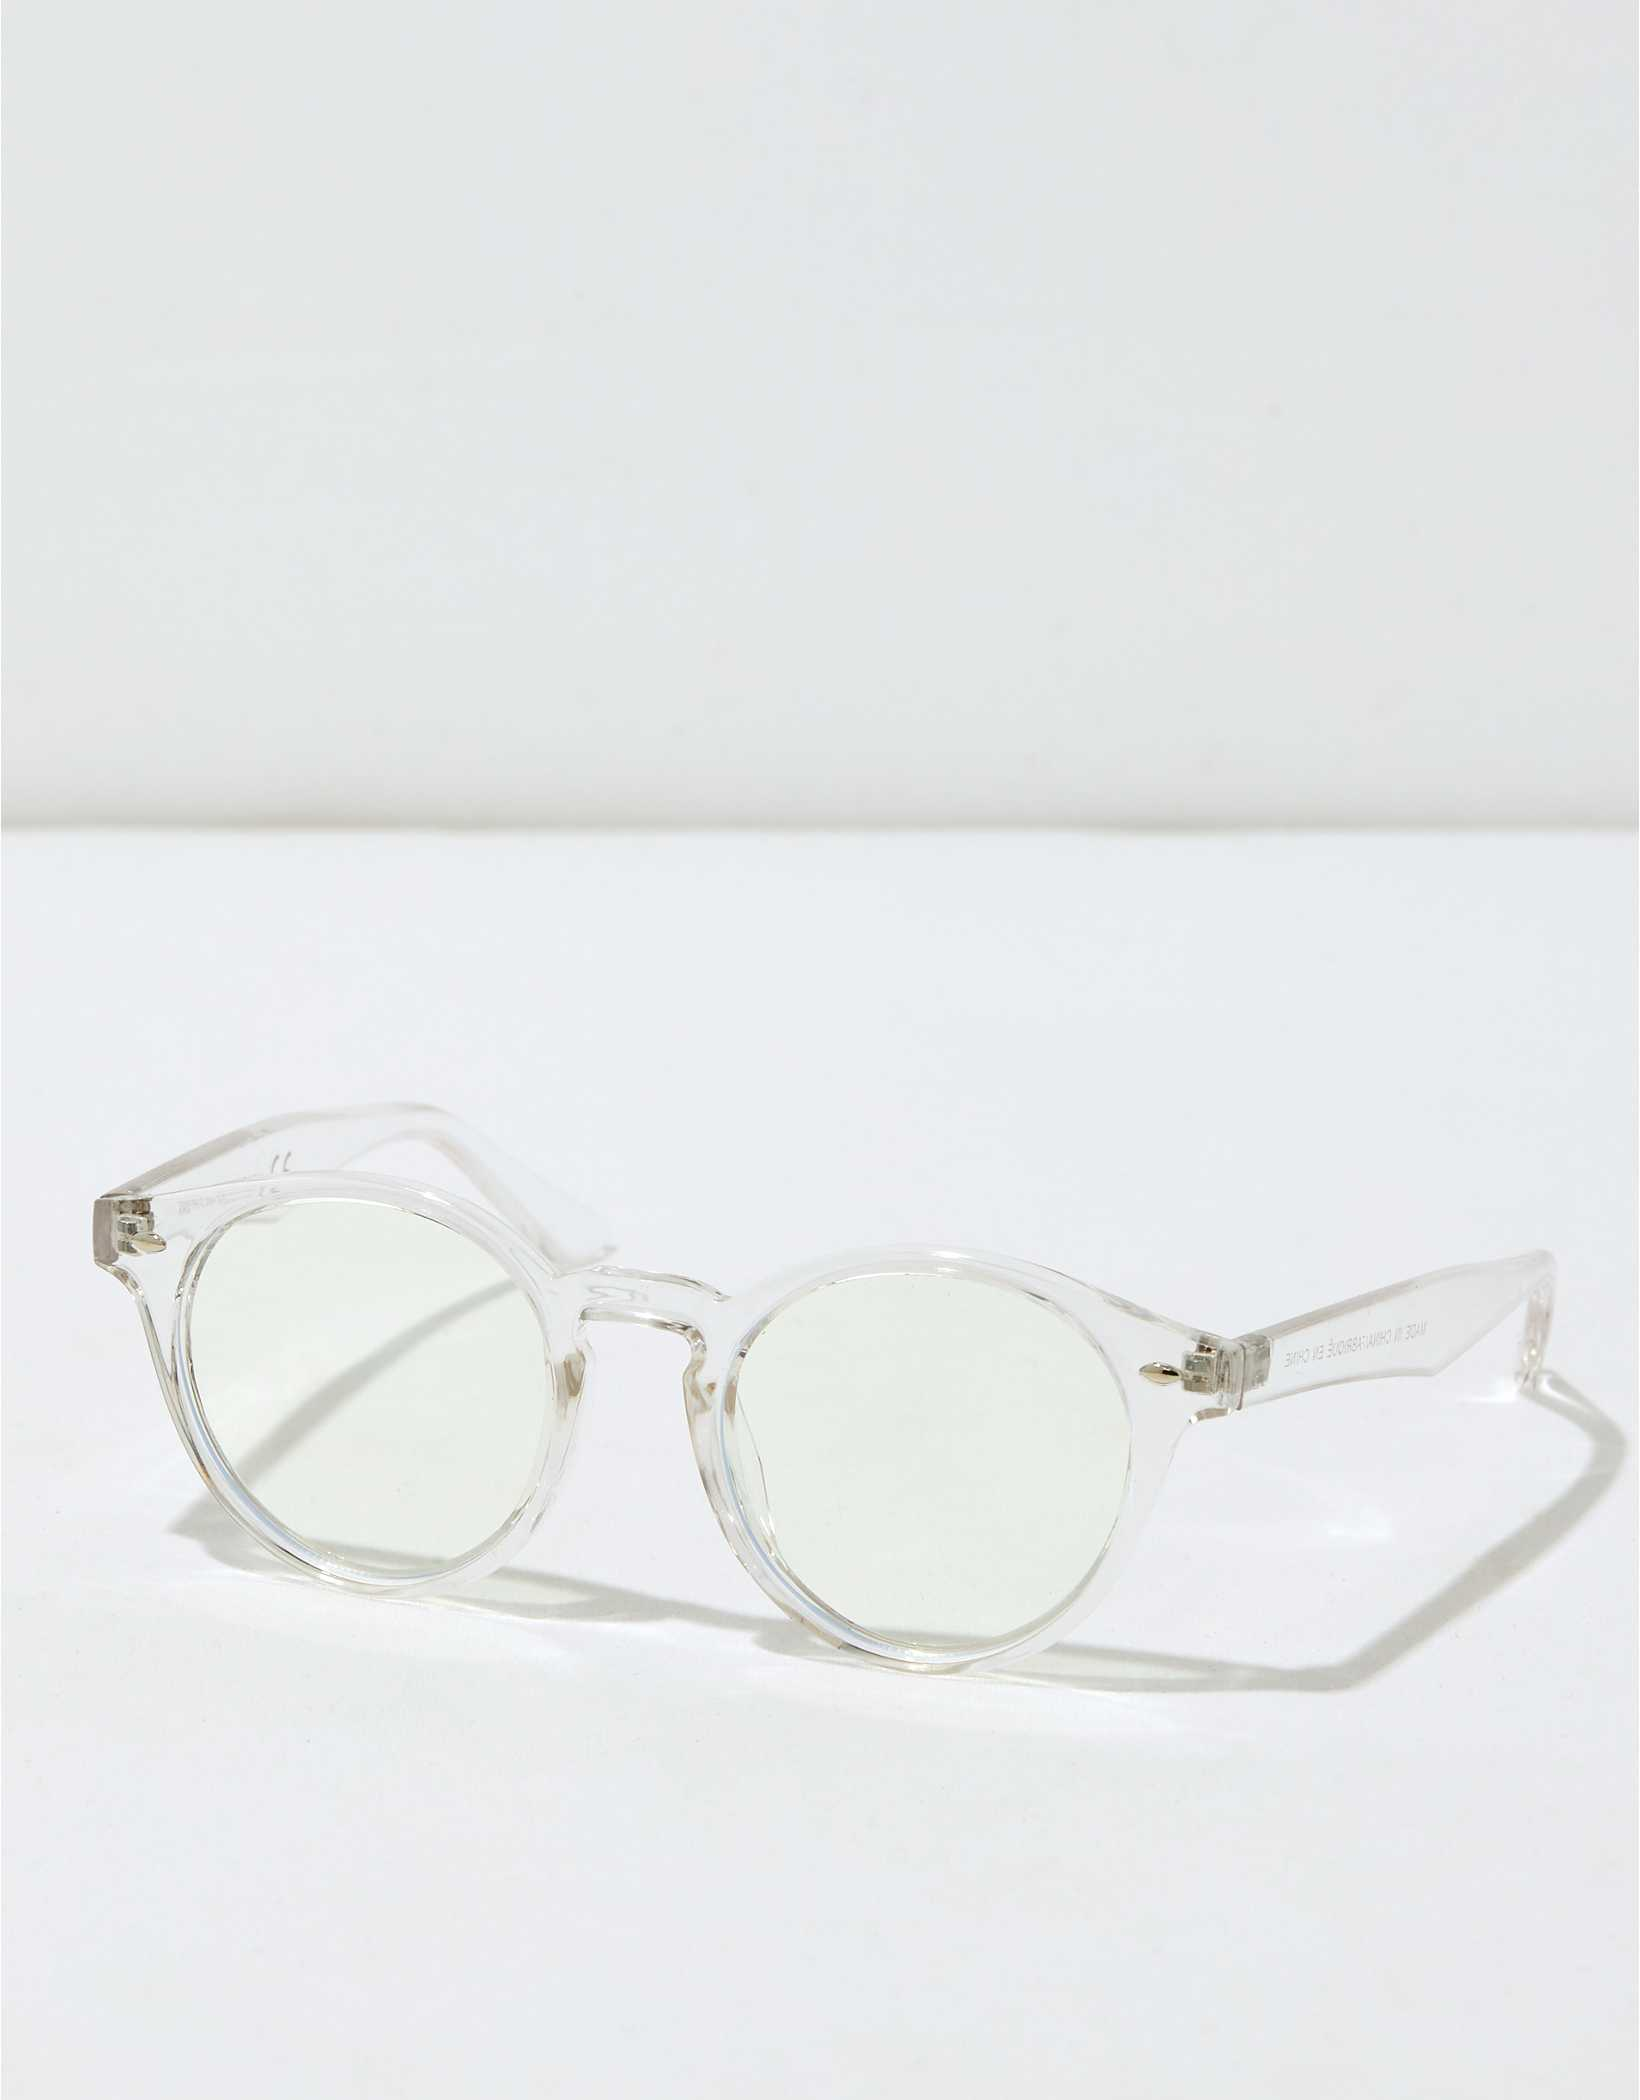 AEO Round Reader Glasses